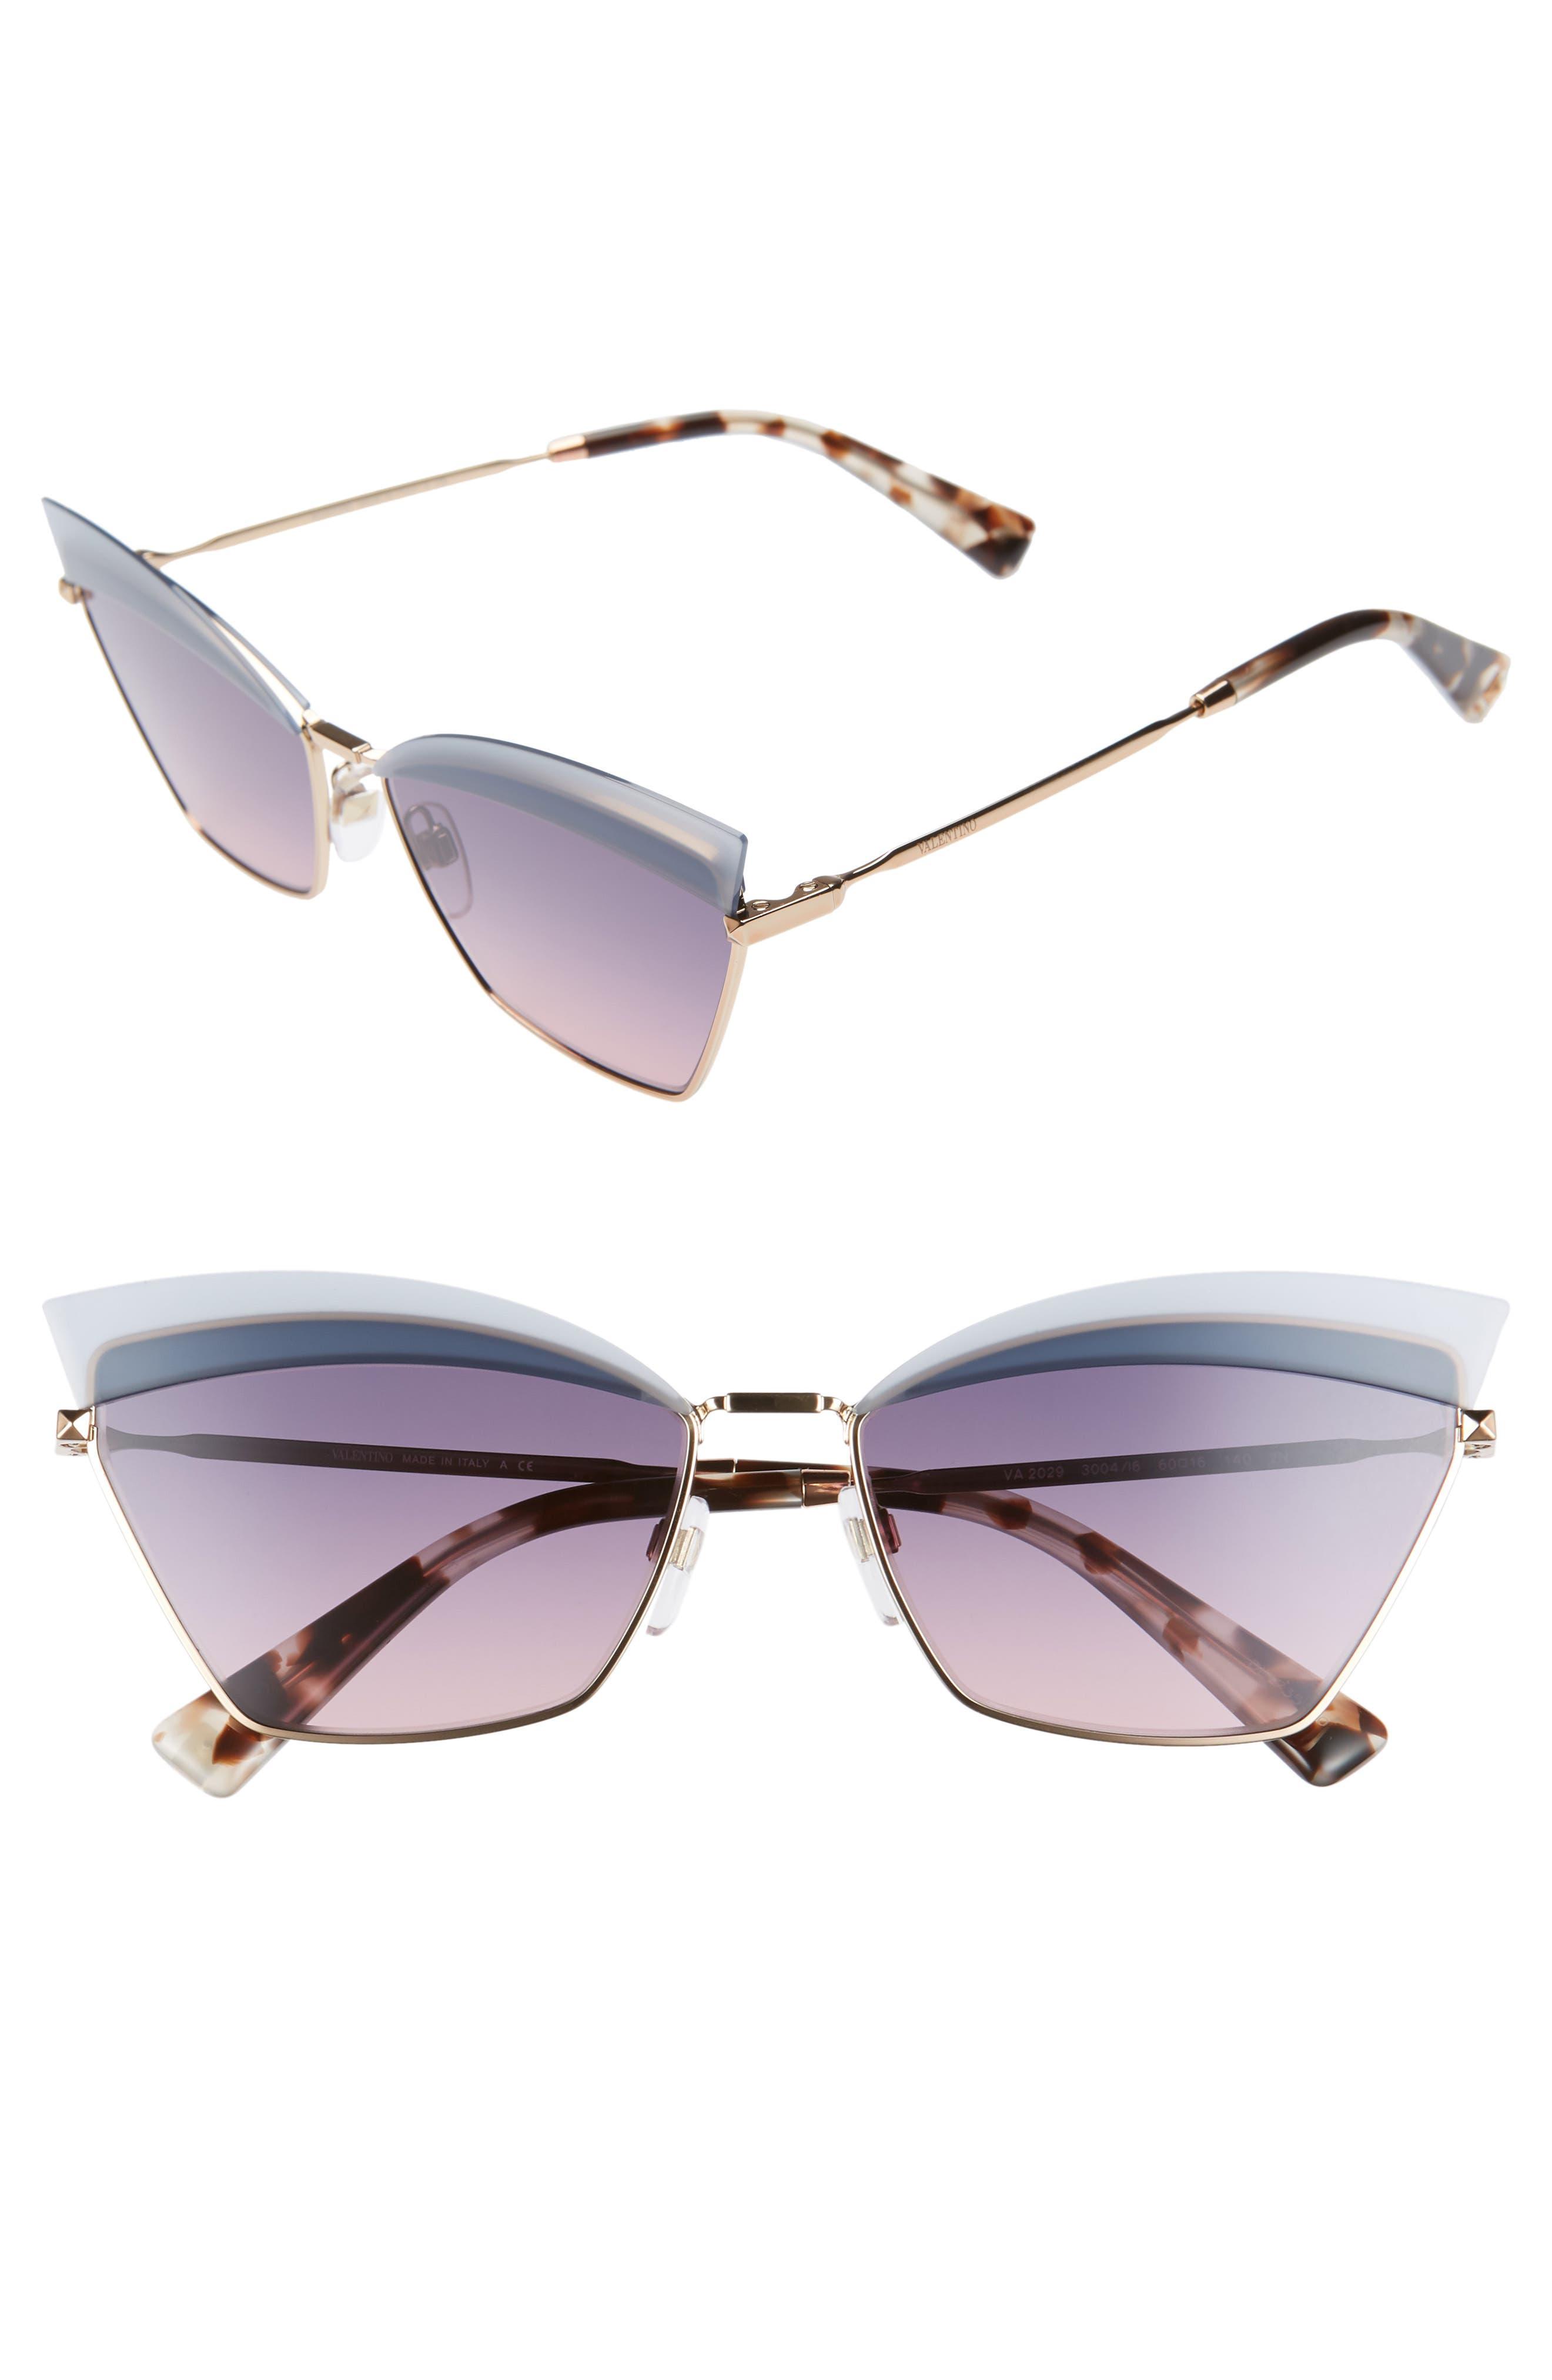 Valentino 60Mm Cat Eye Sunglasses - Rose Gold/ Blue